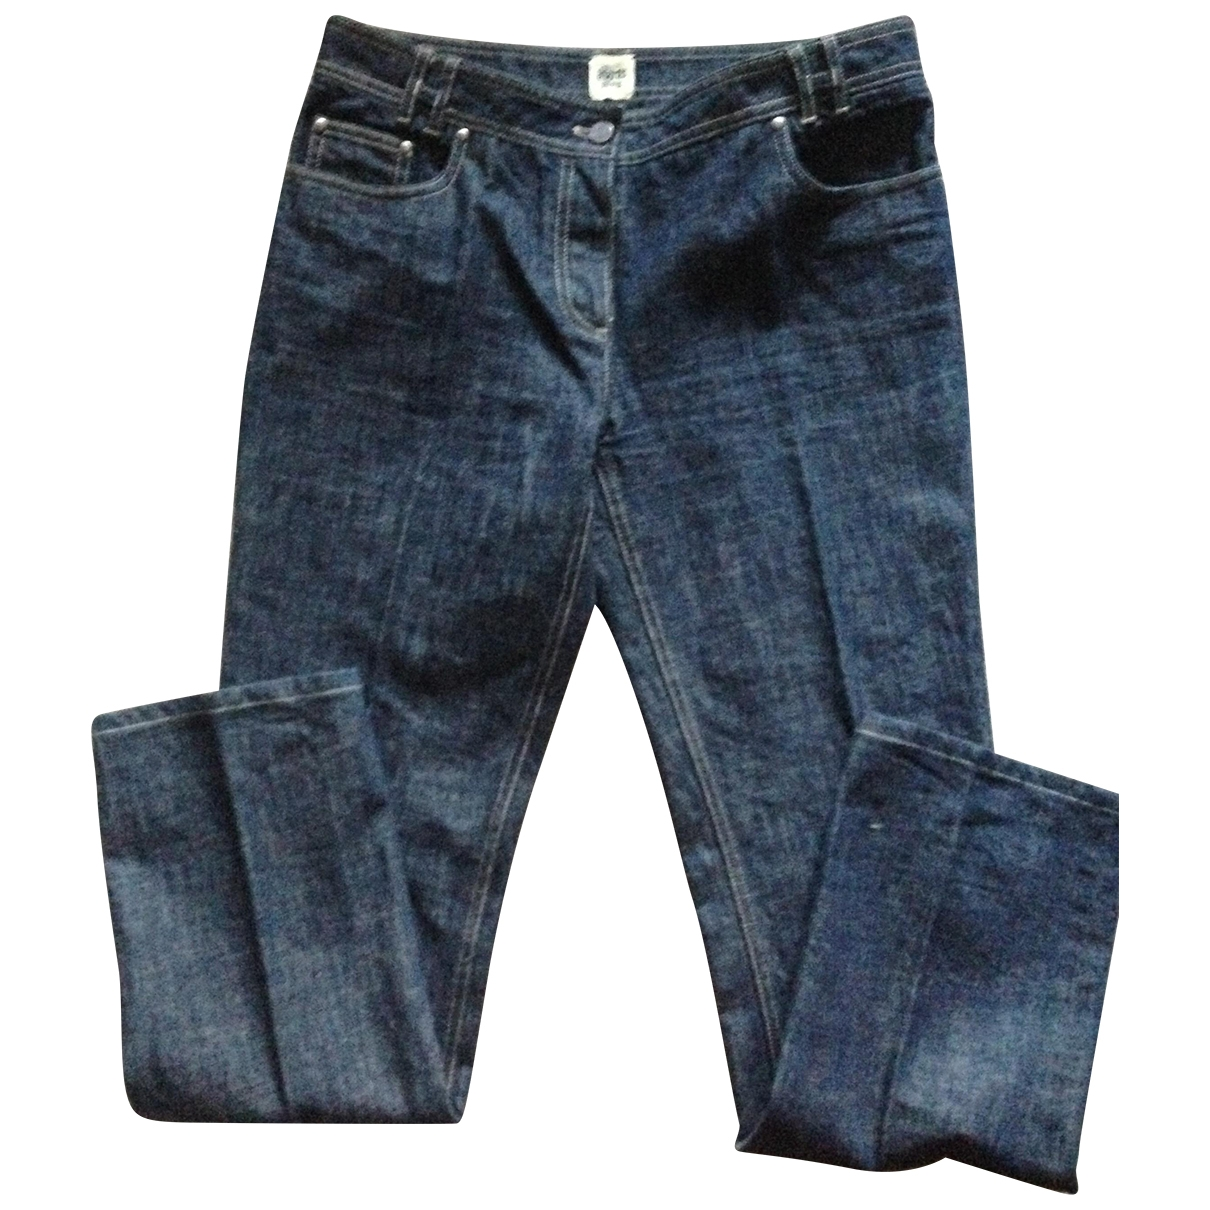 Hermès \N Blue Denim - Jeans Jeans for Women 42 FR